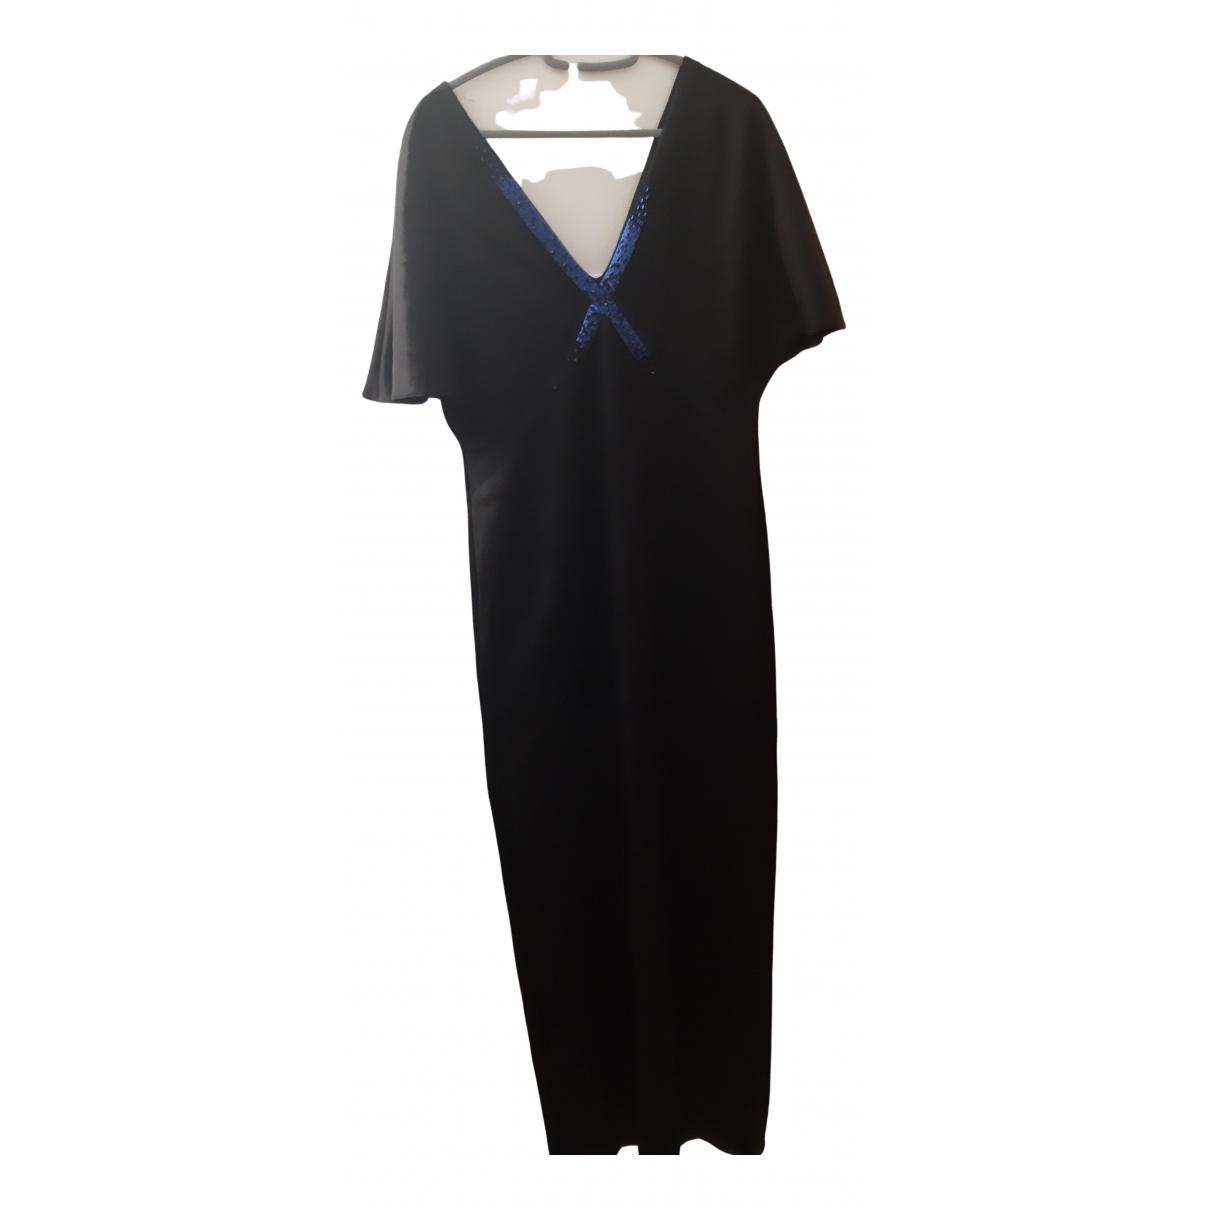 Lanvin \N Kleid in  Schwarz Baumwolle - Elasthan